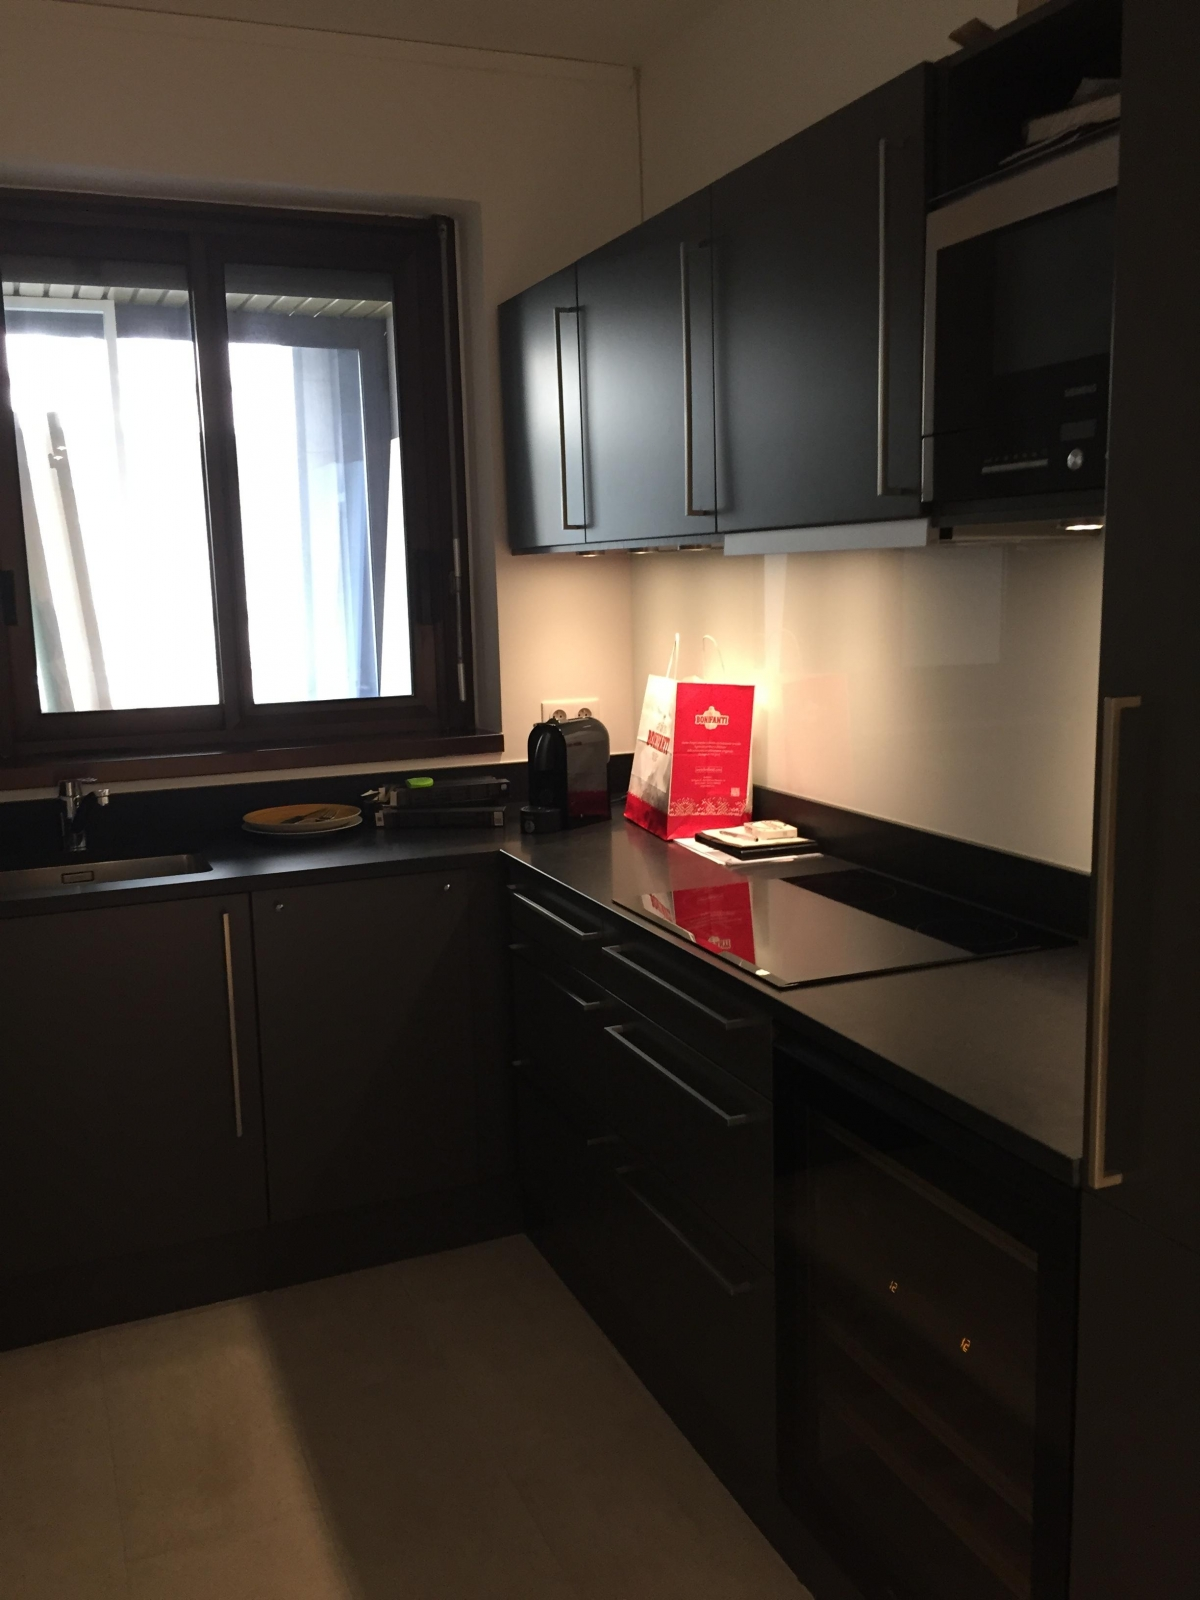 vente vente appartement bureau 39 le montaigne 39 monaco monte carlo. Black Bedroom Furniture Sets. Home Design Ideas